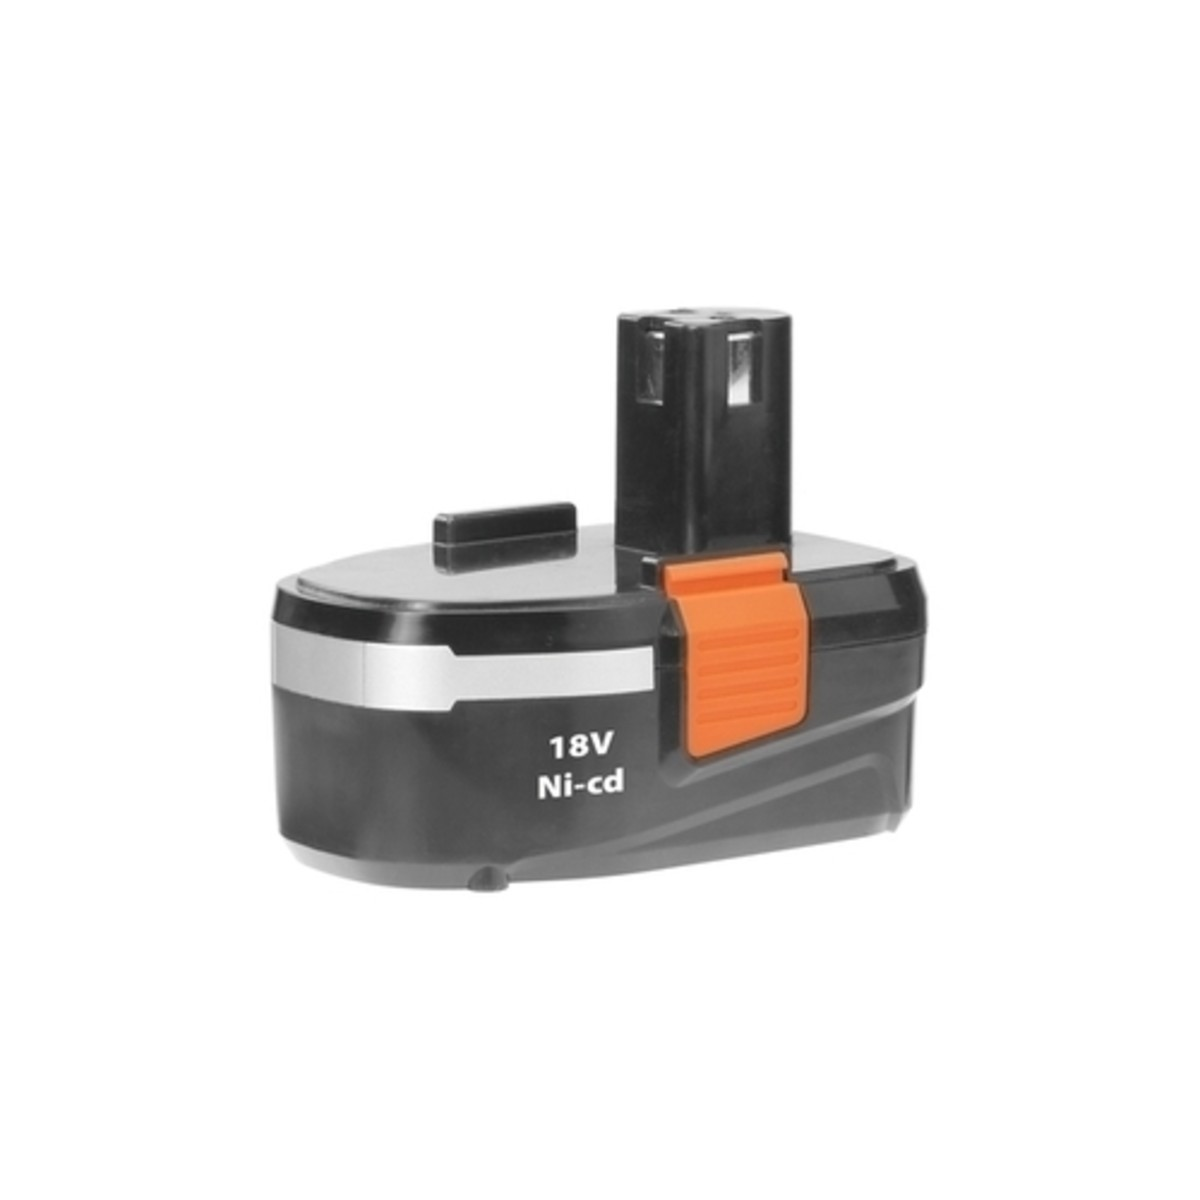 Аккумулятор Dexter 1.5 Ач Ni-Cd 18 В для аккумуляторного инструмента